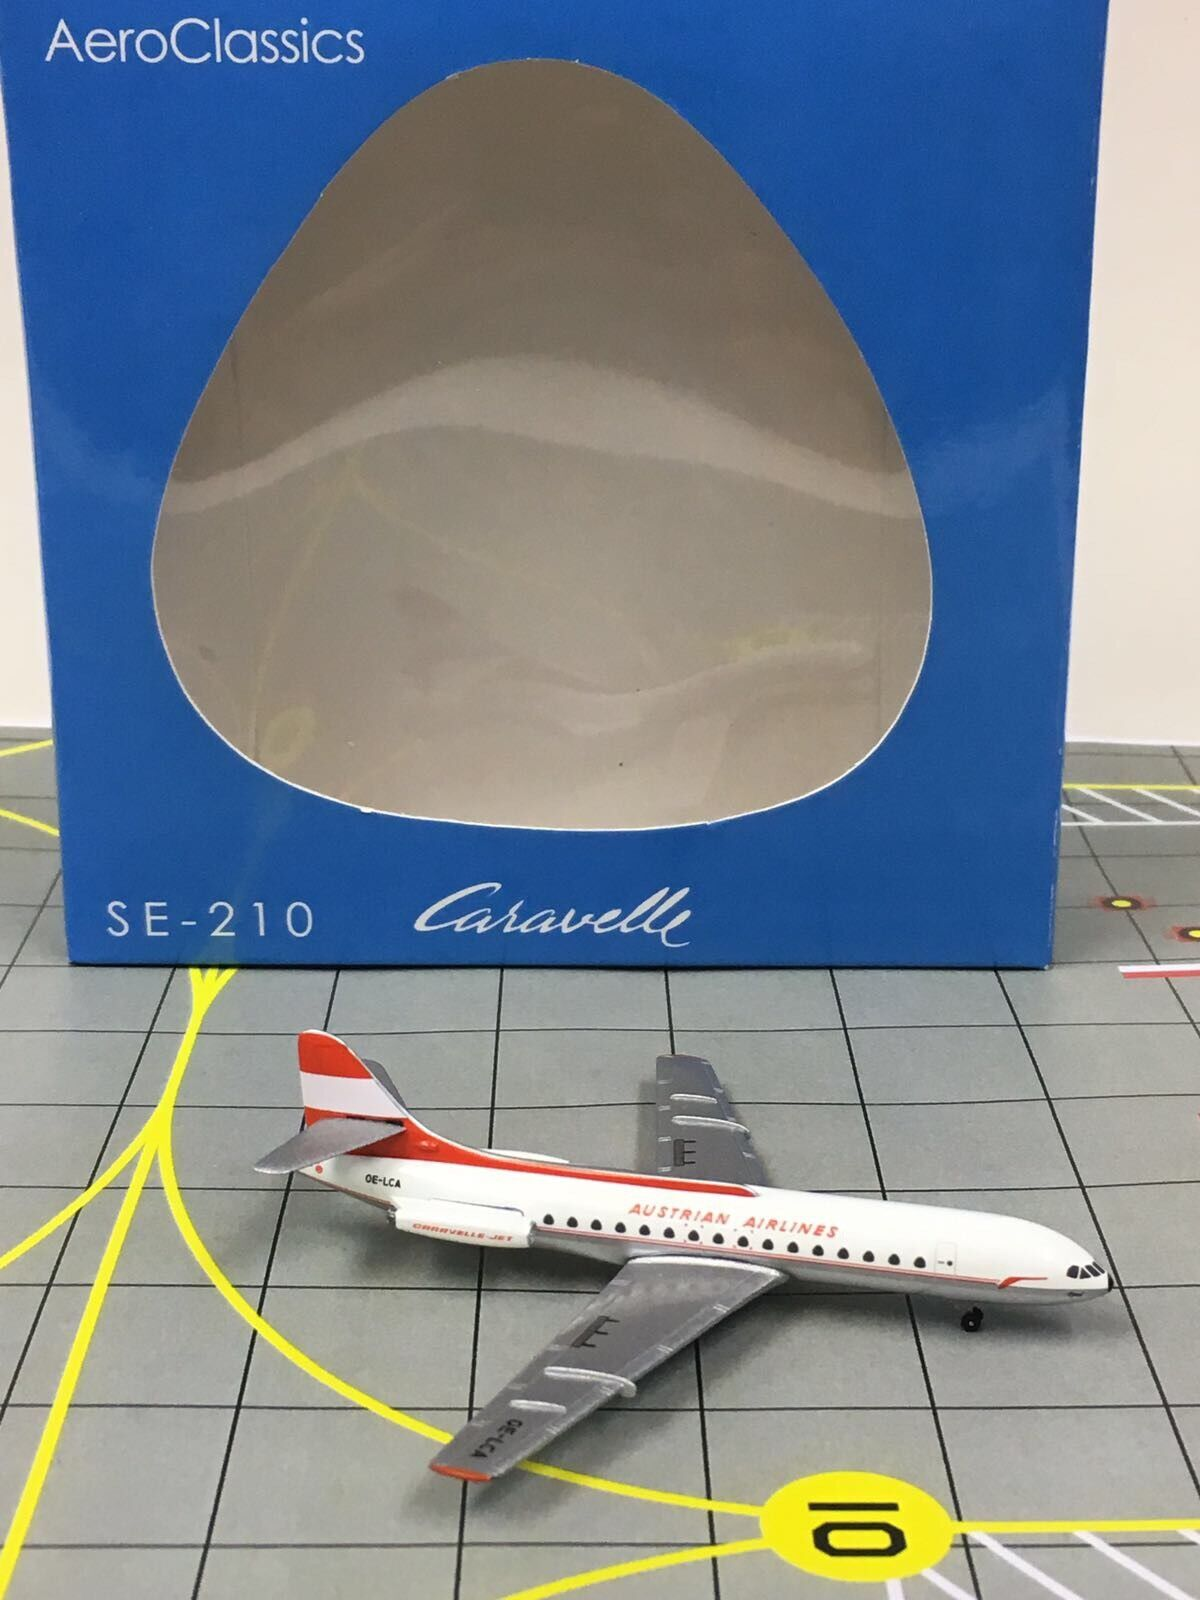 RARE Aeroklassics 1 400 Austrian Airlines SE -210 bilavelle OE -LCA